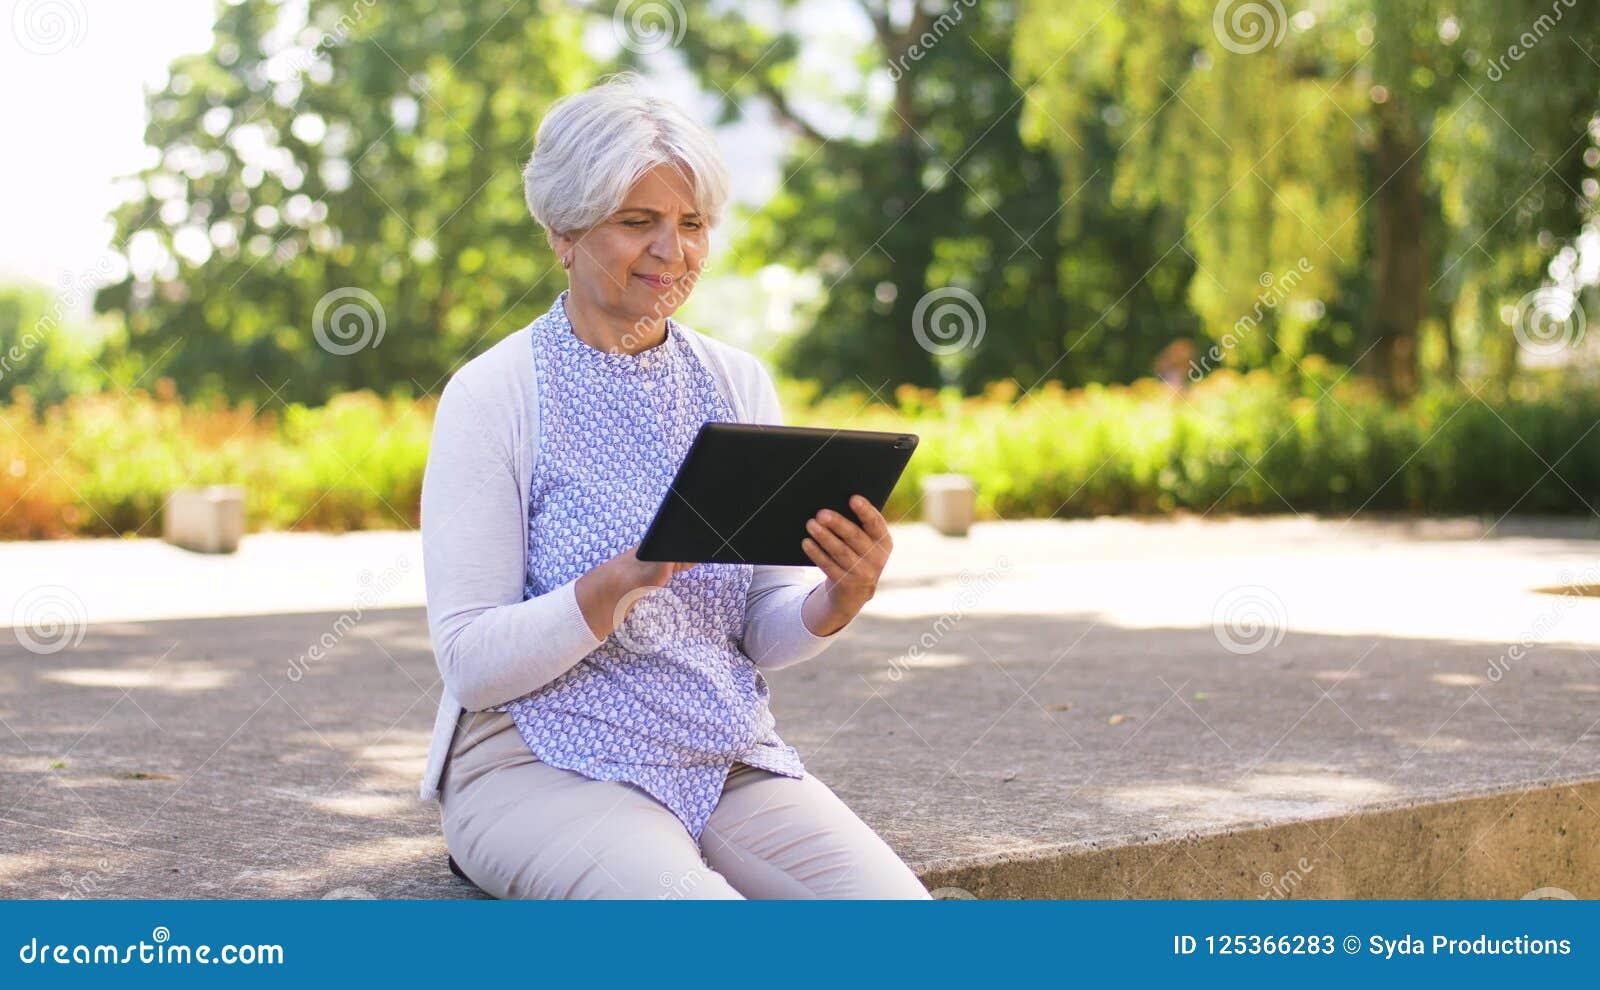 Florida Uruguayan Senior Singles Dating Online Site